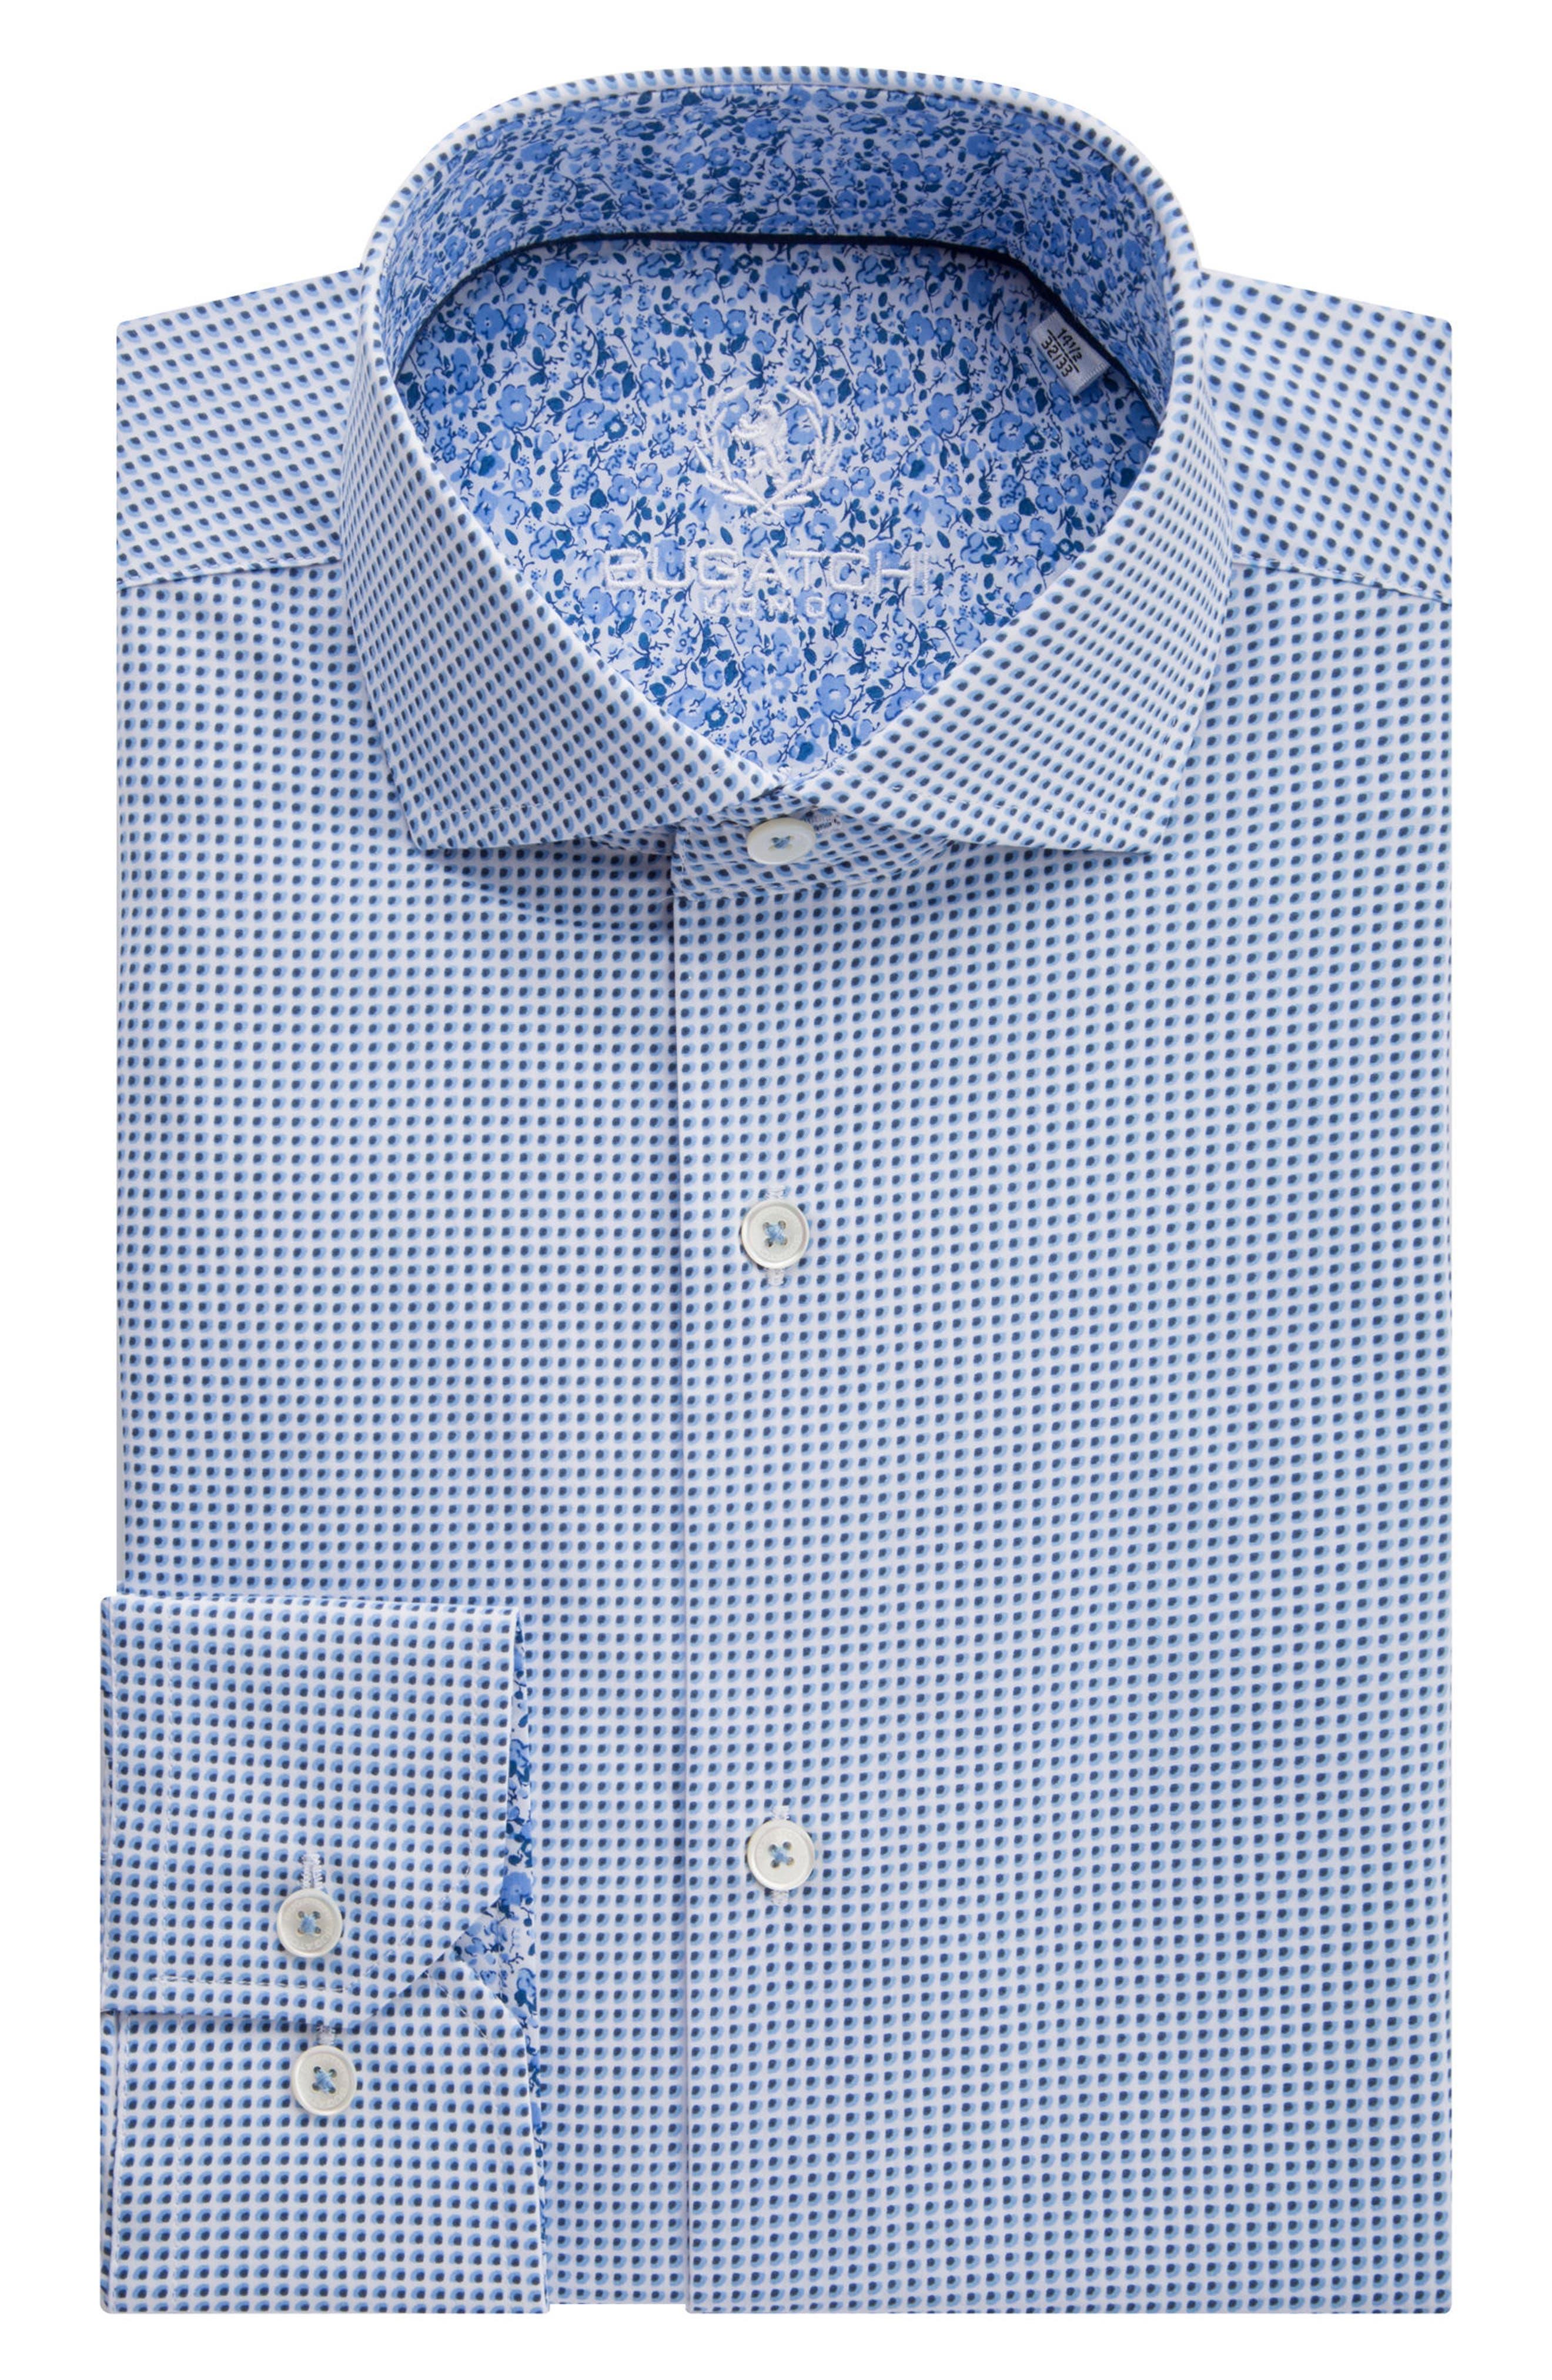 Trim Fit Geometric Dress Shirt,                             Main thumbnail 1, color,                             Classic Blue